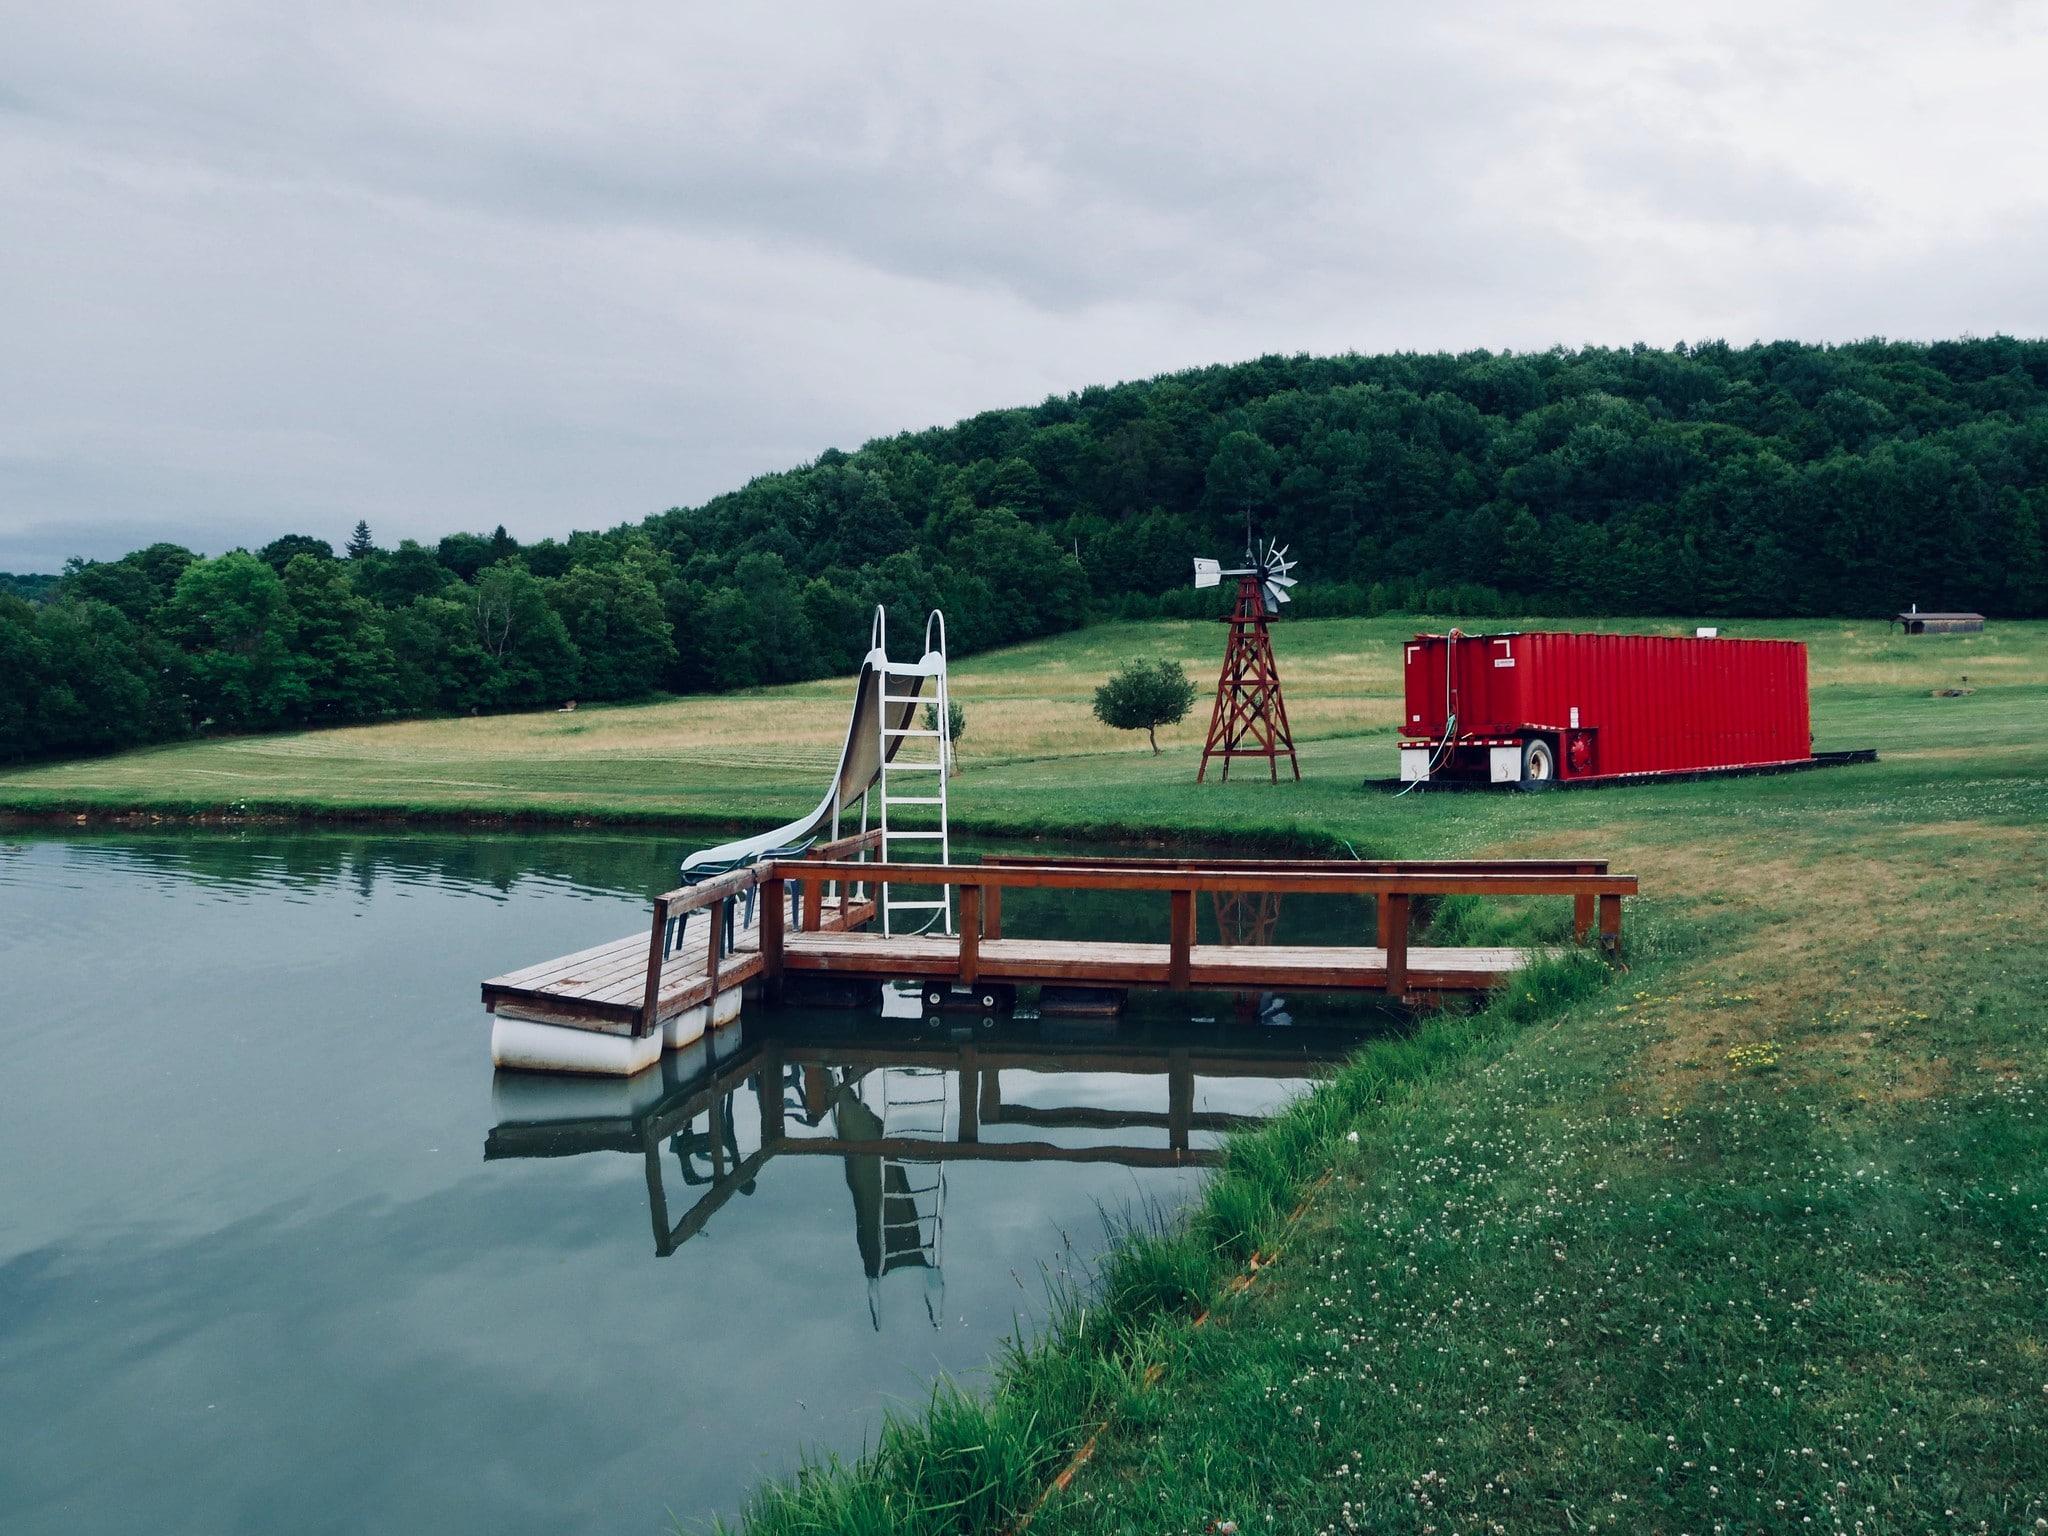 Genesee Township Fracking Water Contamination